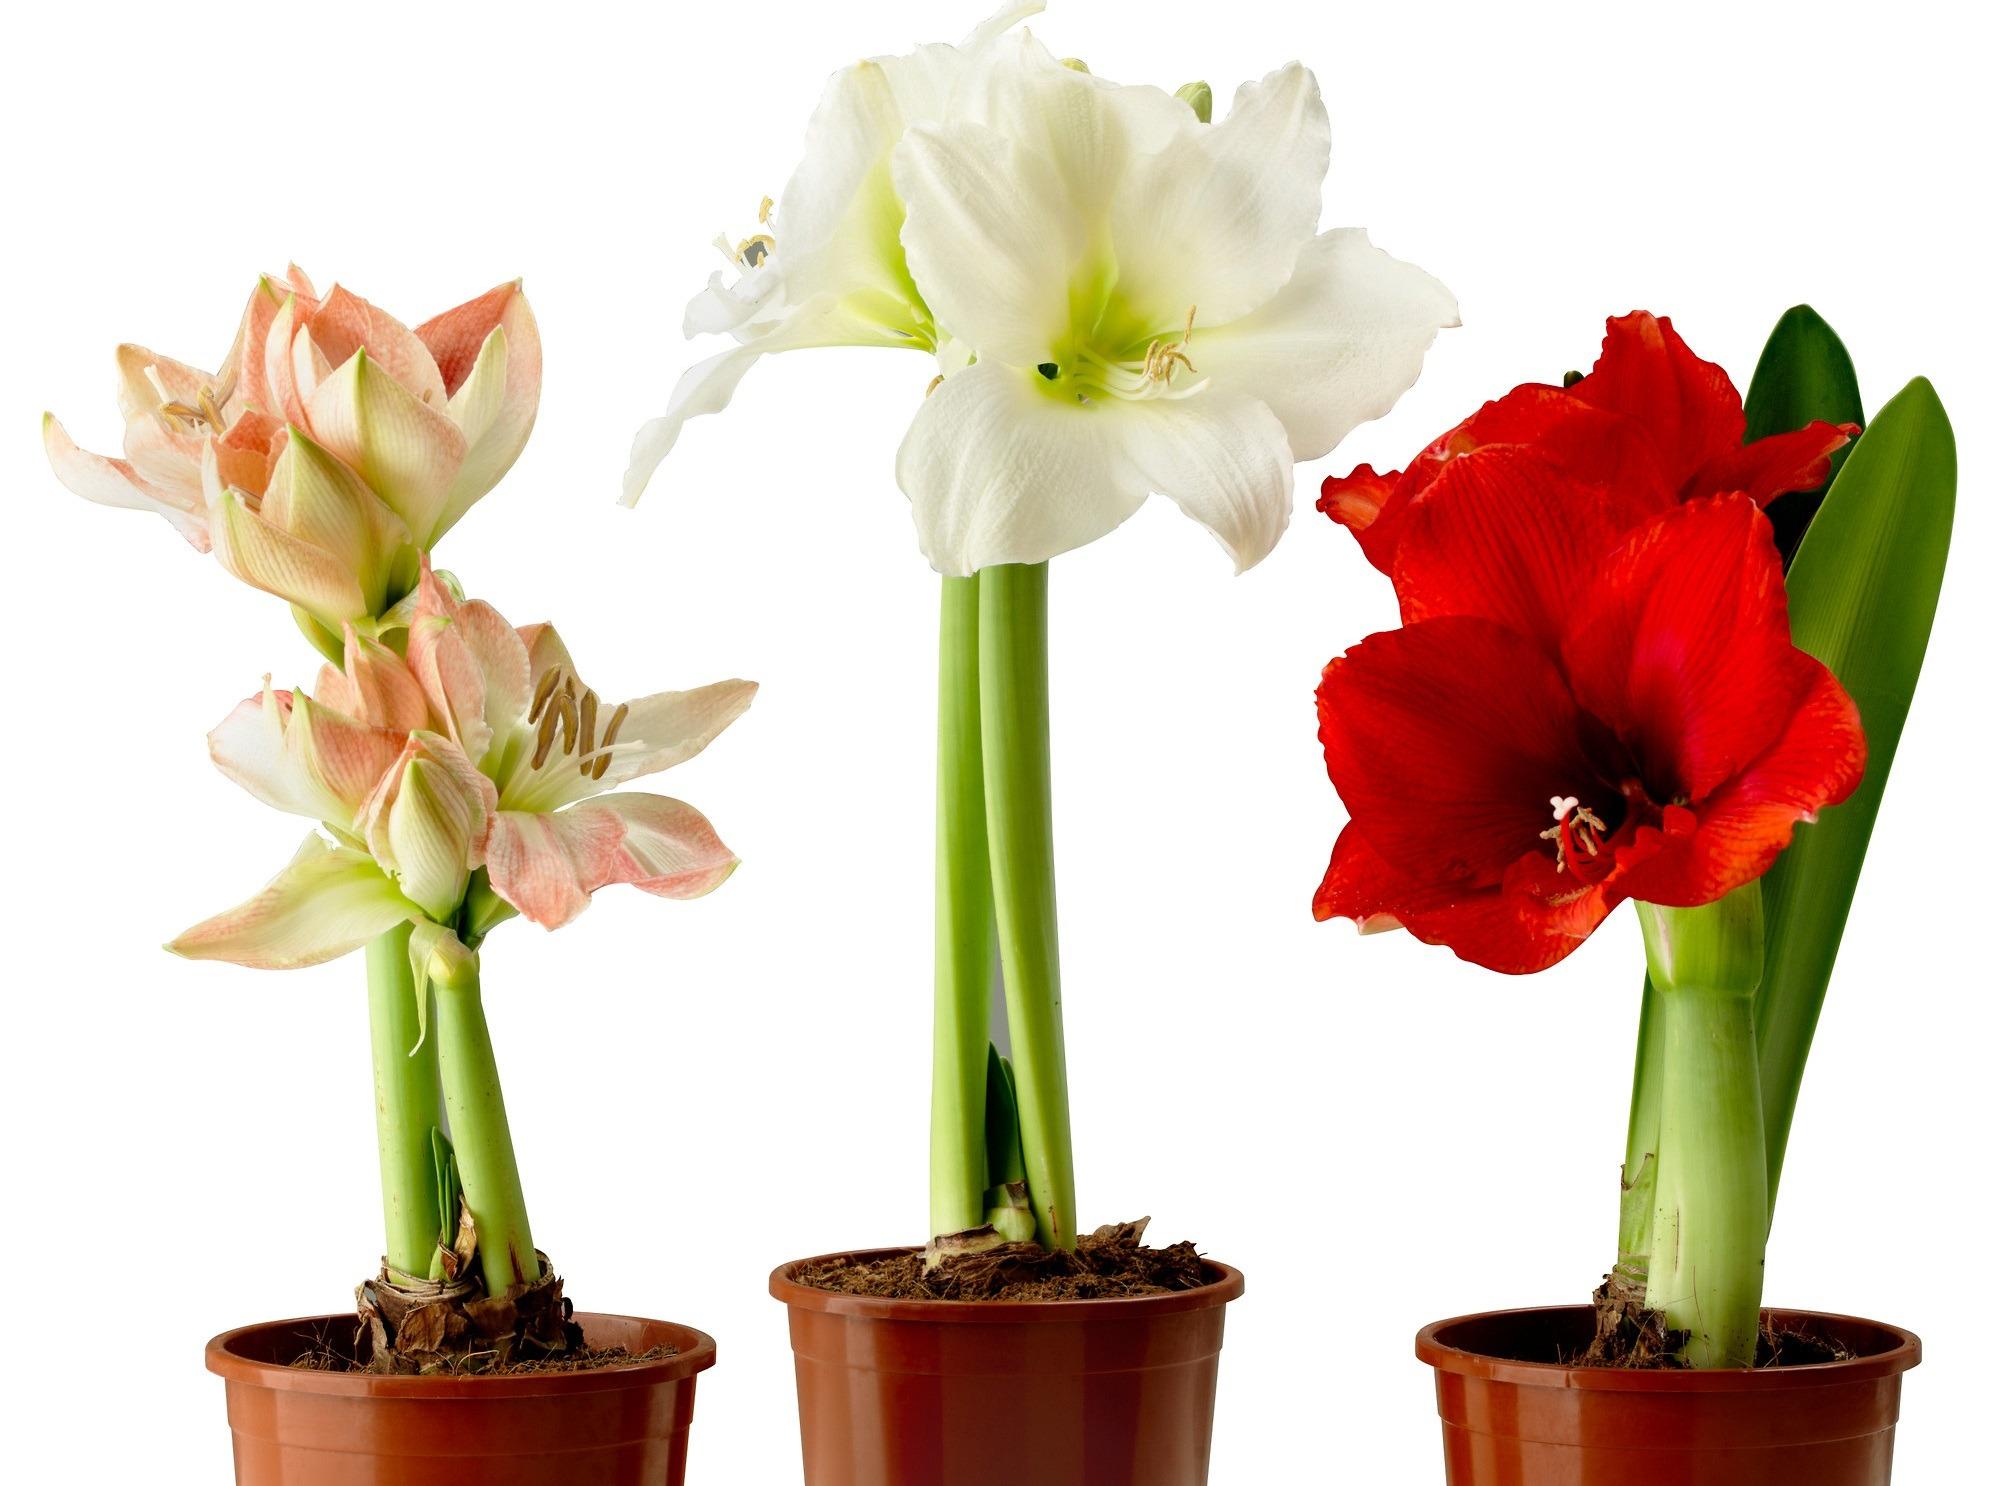 Цветок амариллис или гиппеаструм